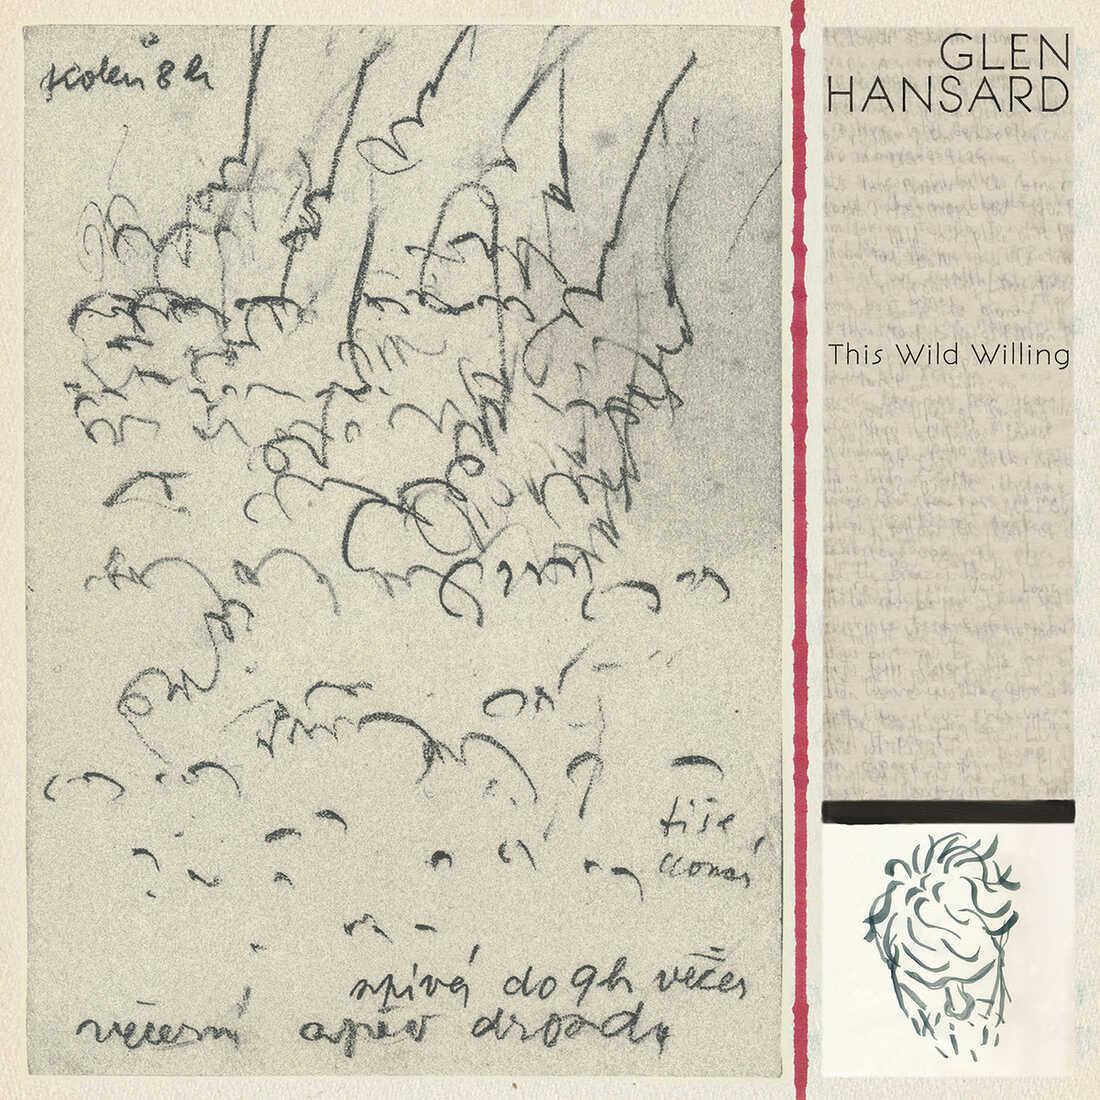 Glen Hansard, This Wild Willing